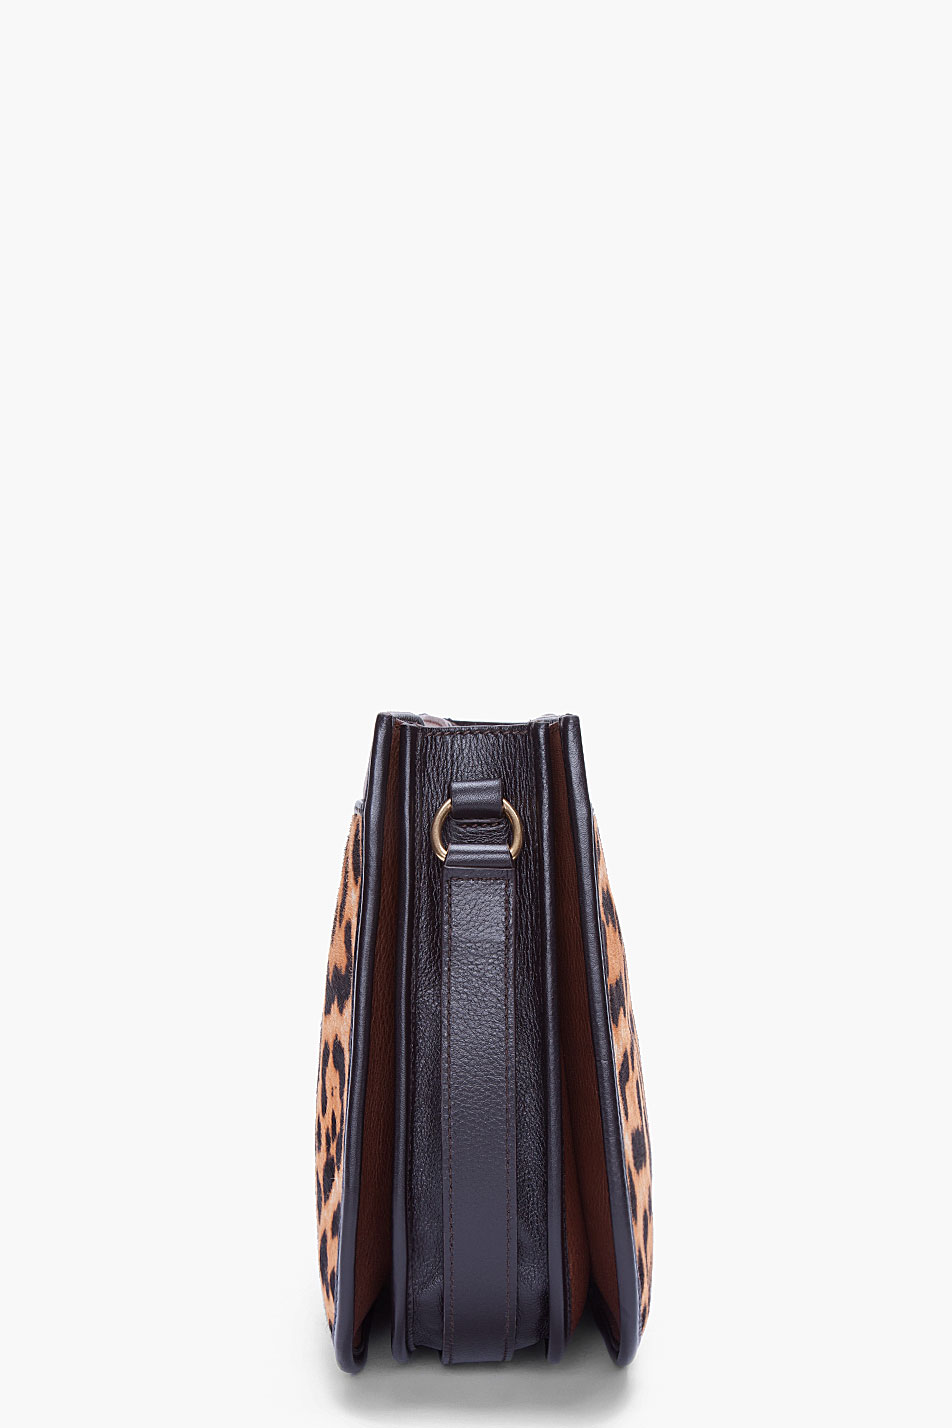 Yves Saint Laurent Leopard Print Shoulder Bag Yves Saint